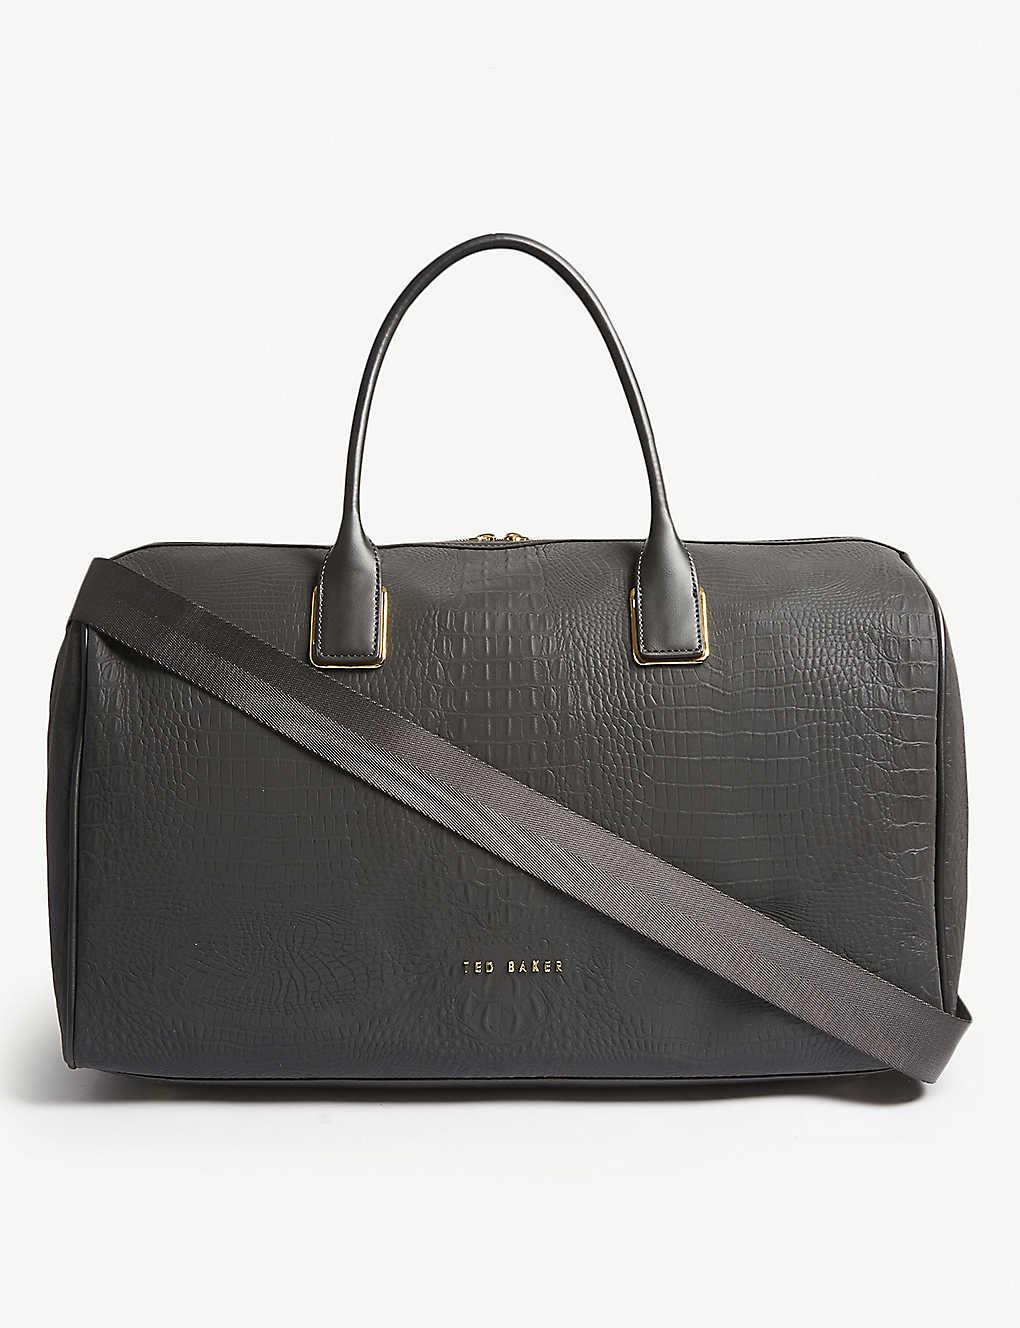 190187f79555 TED BAKER - Conneli croc-effect duffle bag